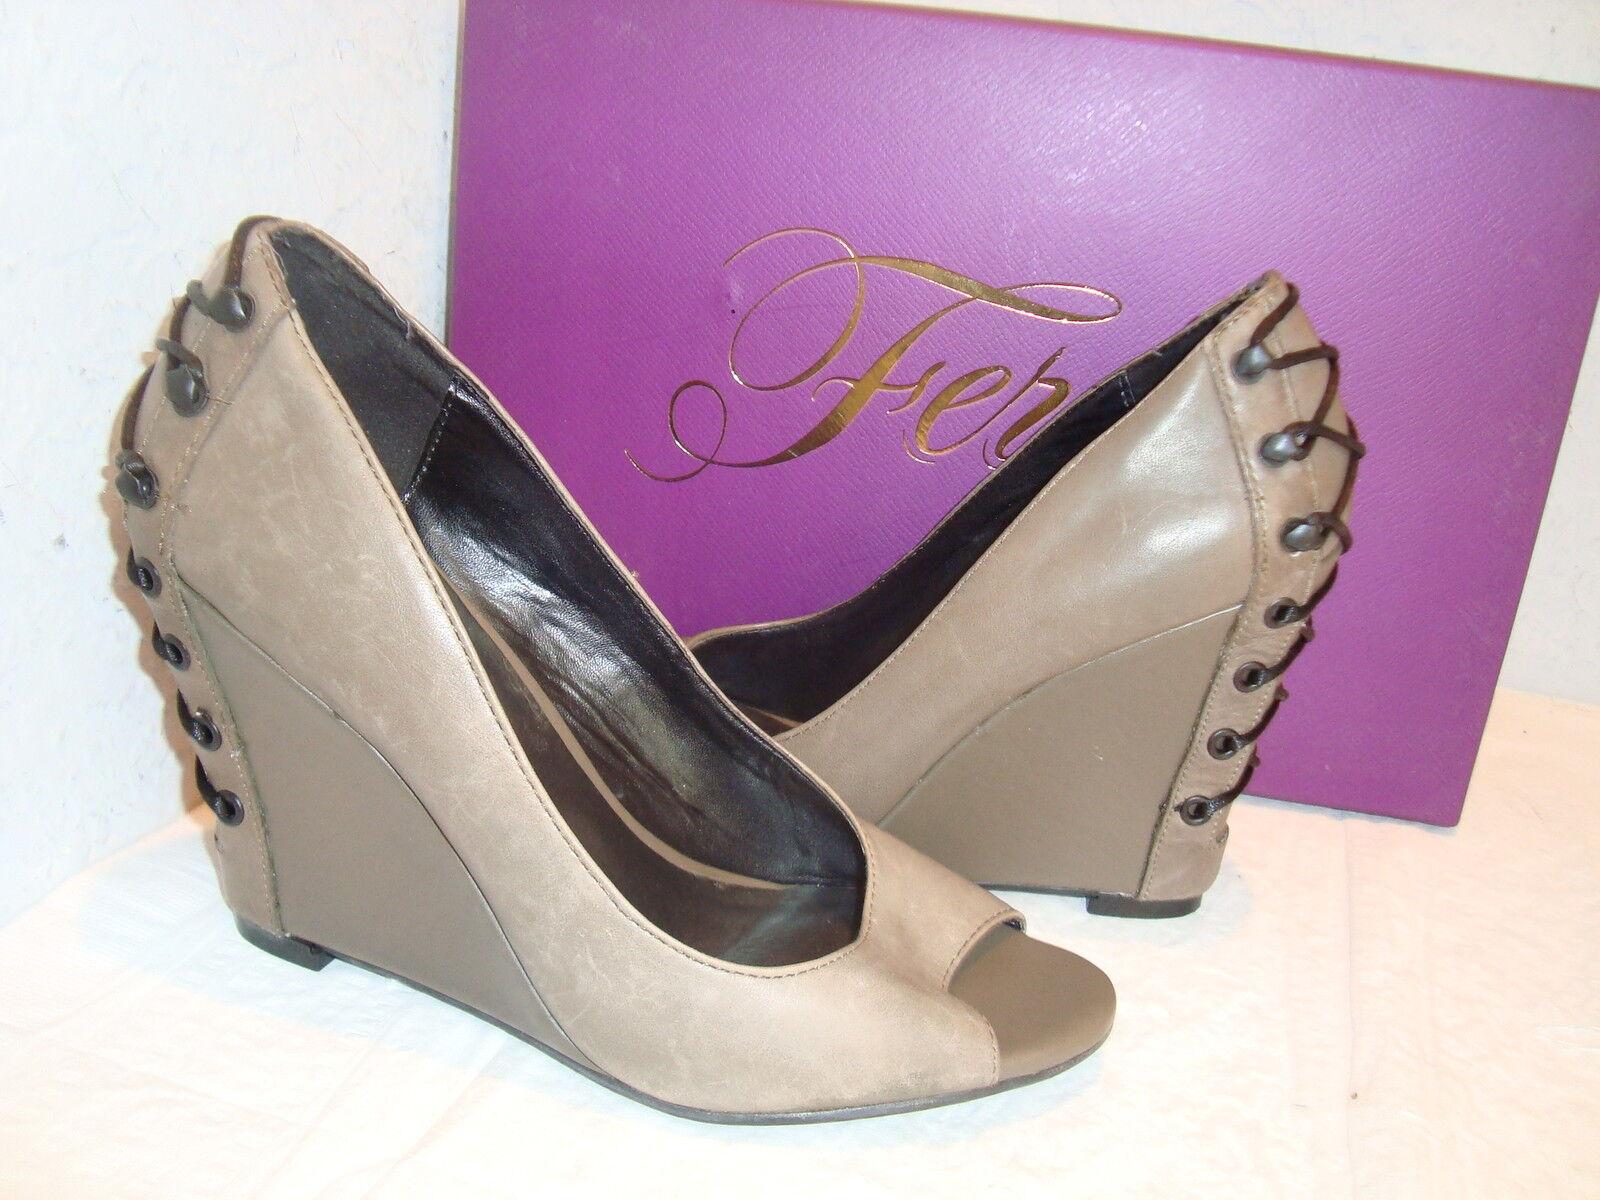 NEU Fergie Damenschuhe Bionic Taupe Wedge Open Toe Schuhes 6 Medium